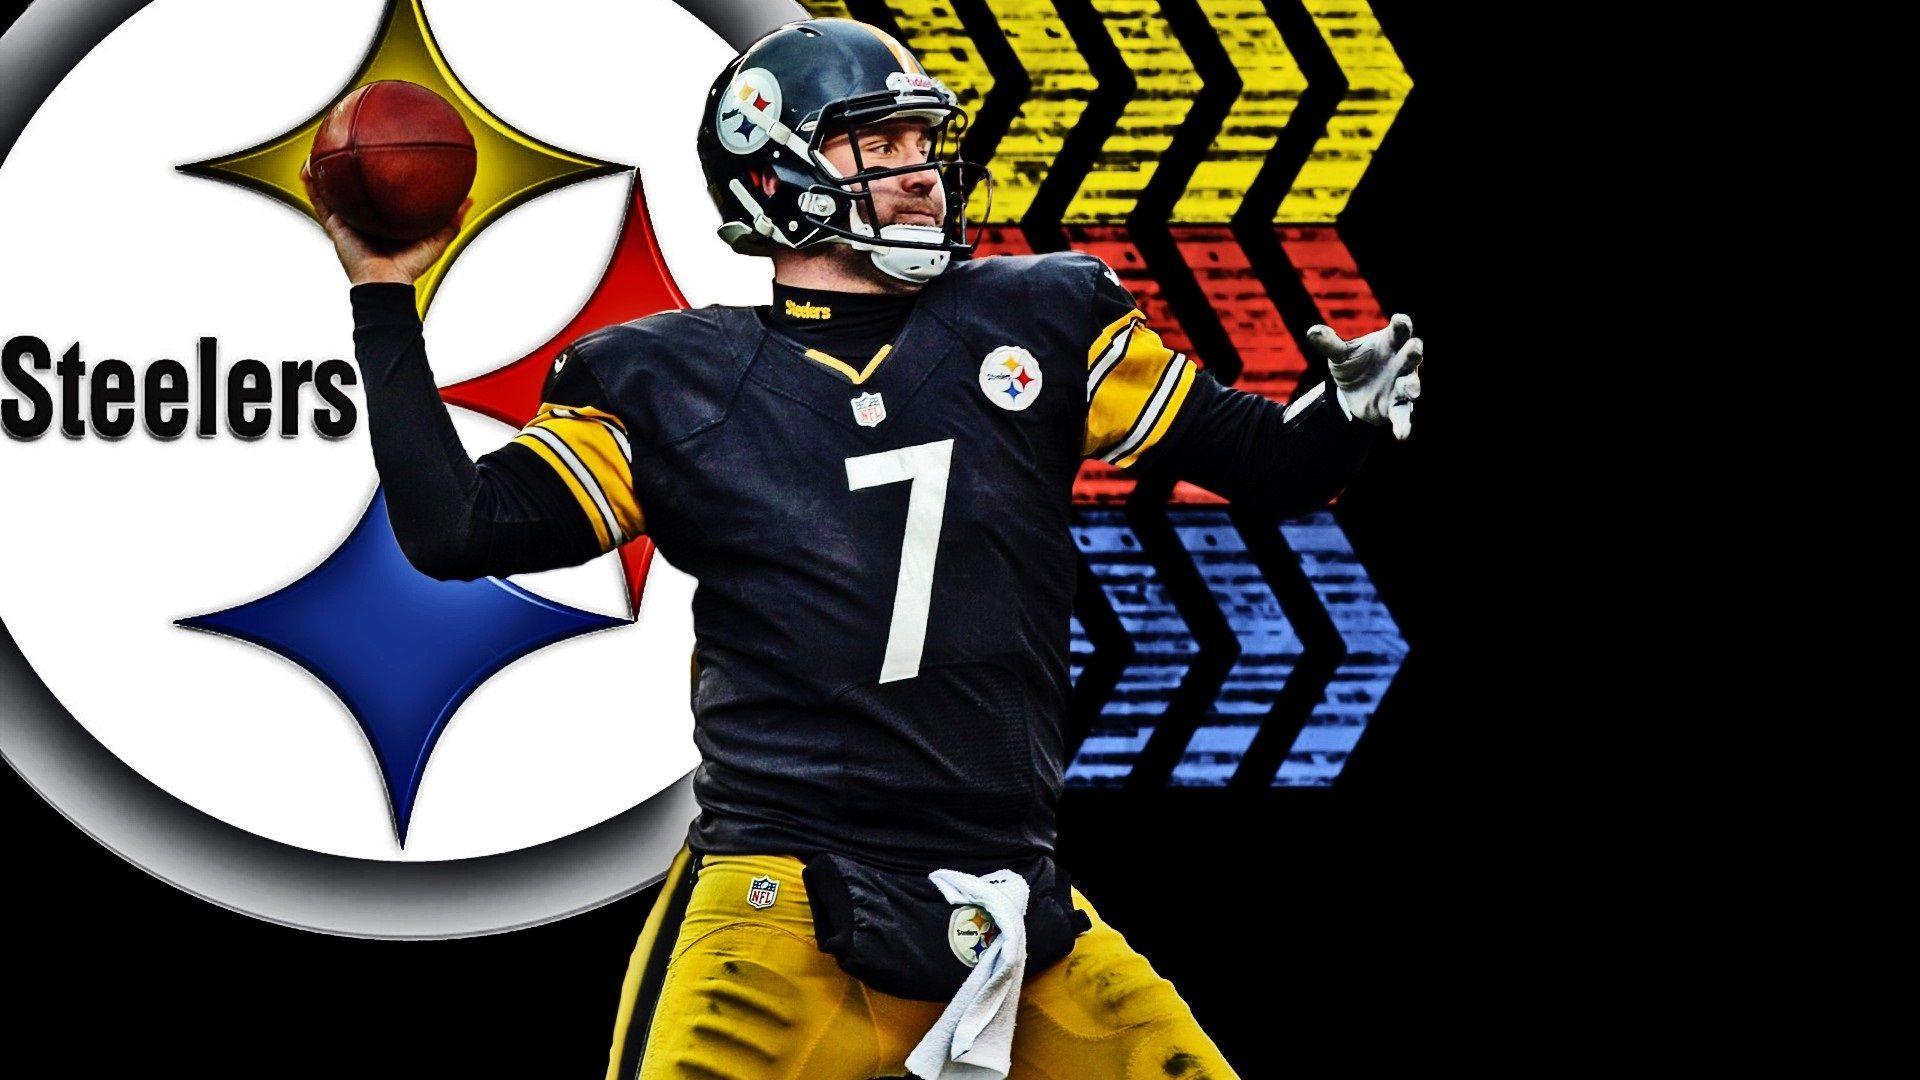 Nfl Wallpapers Nfl Football Wallpaper Nfl Steelers Mac Backgrounds